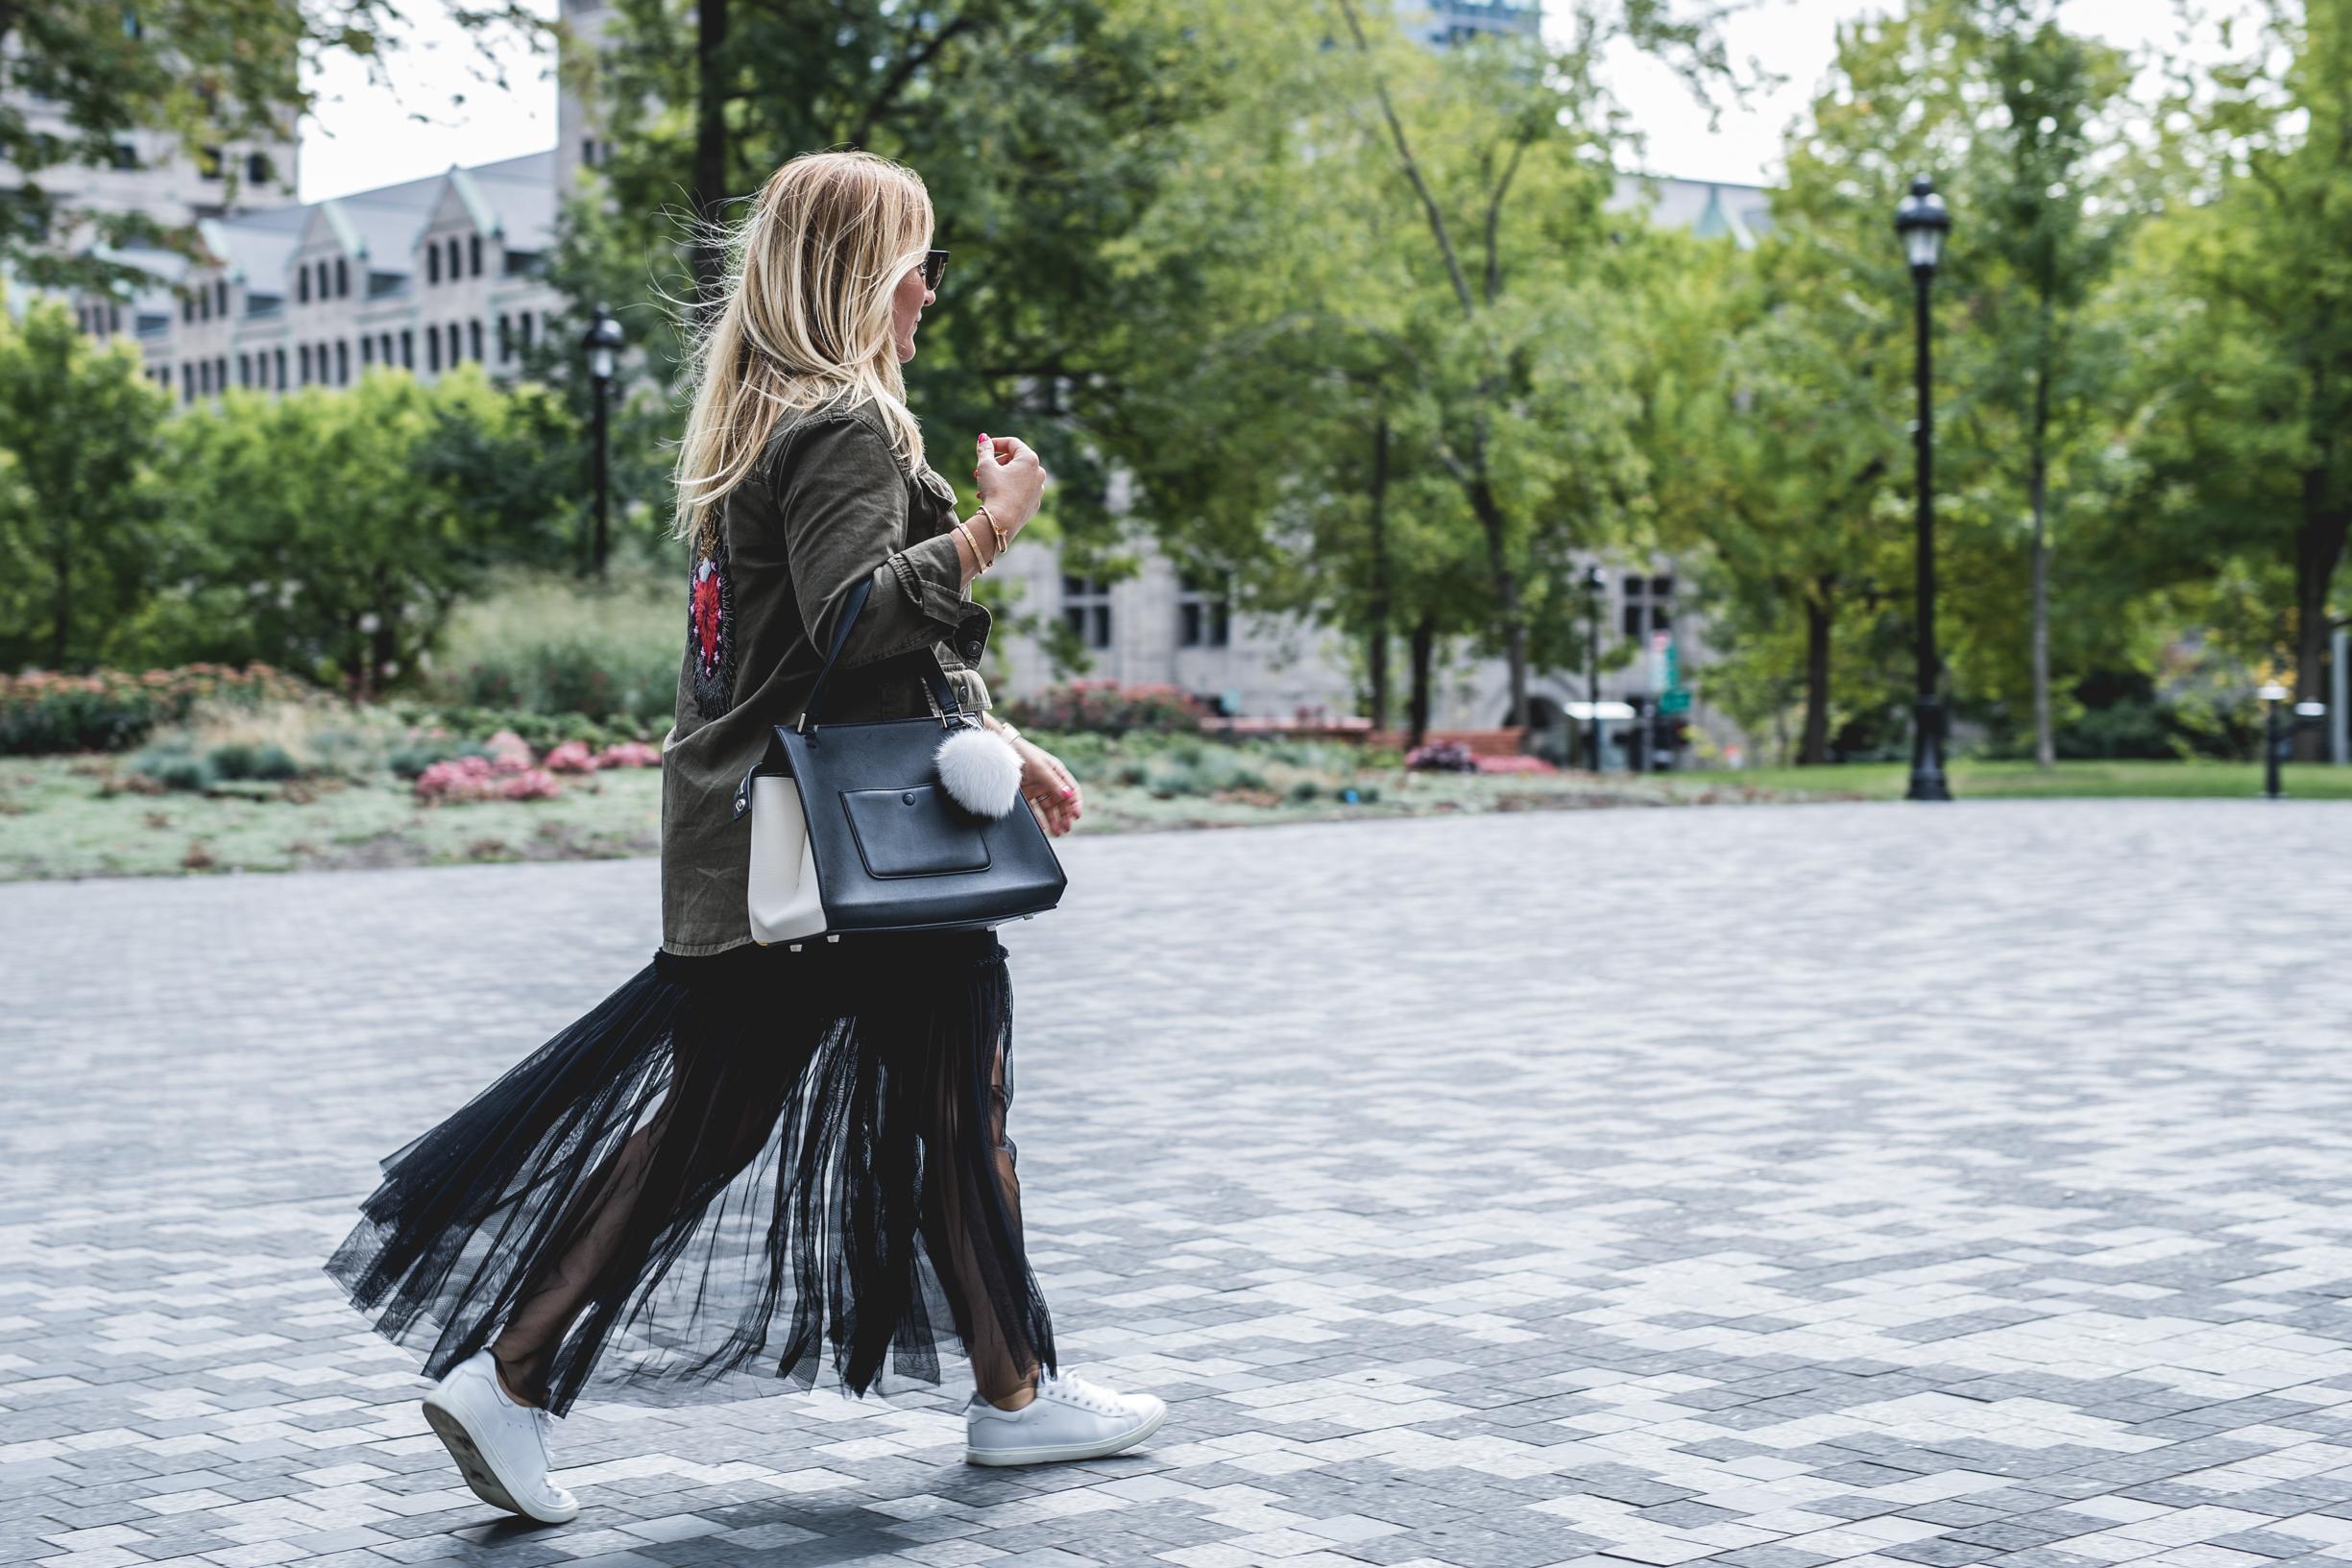 cargo jacket tule skirt fashion blogger mademoiselle jules mlle fur pompom sneaker iro paris streetstyle fall trends look style